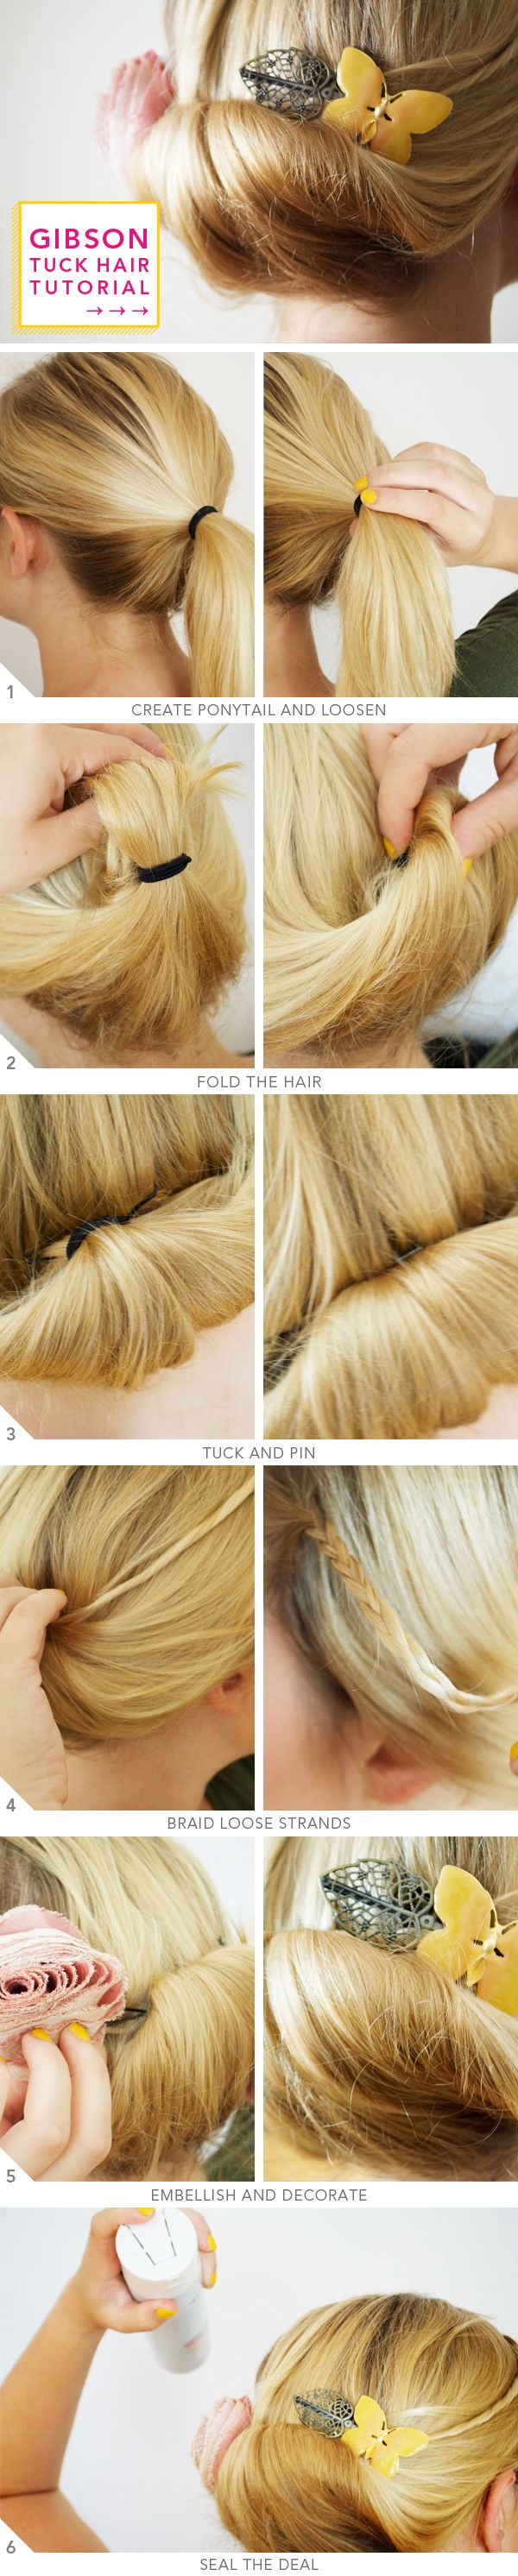 DIY Gibson Tuck Hair Tutorial